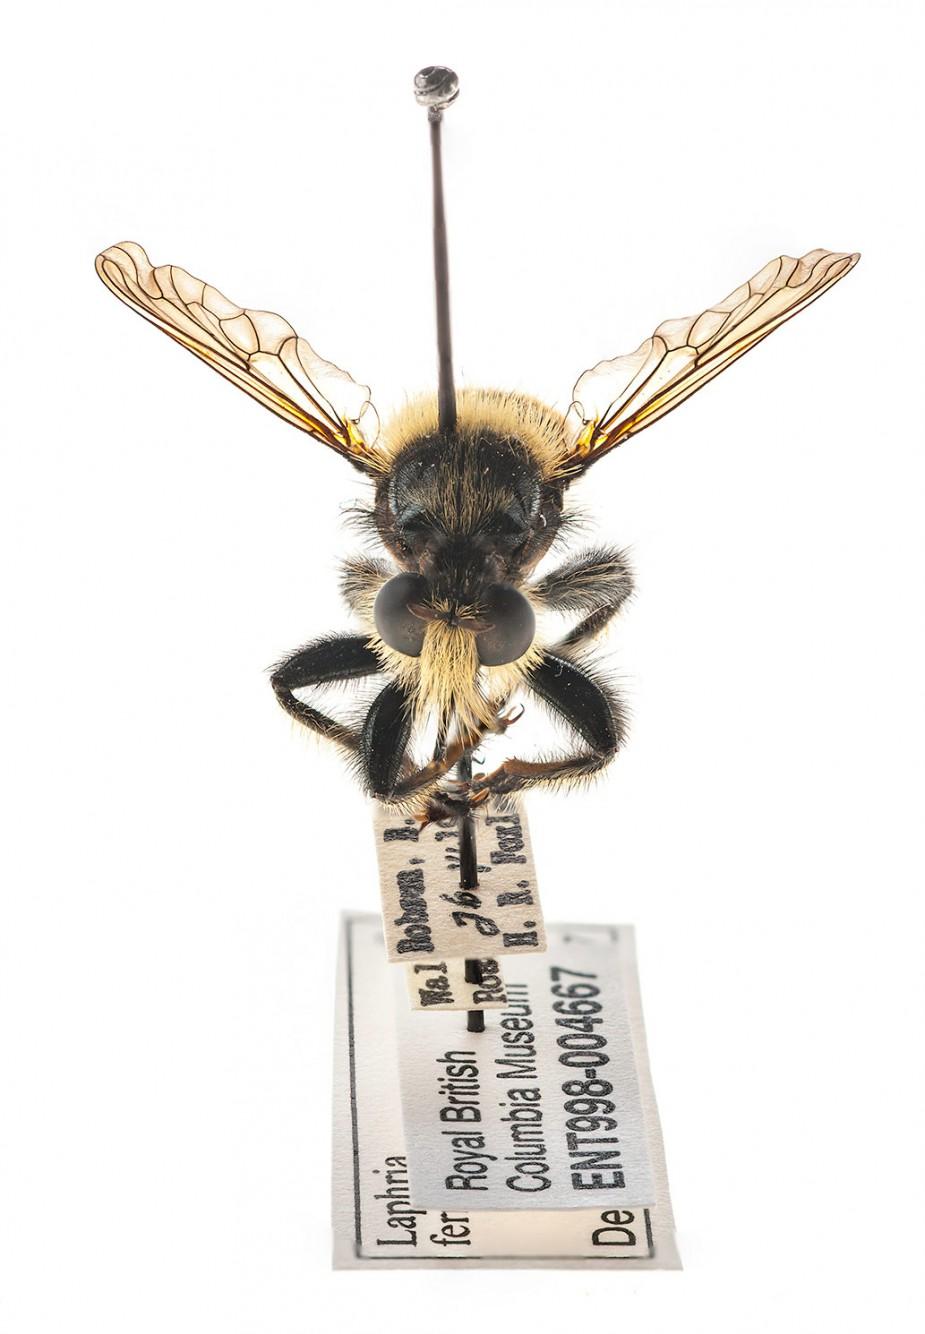 Laphria fernaldi (Order Diptera: Family Asilidae) - Bee-like Robber Fly